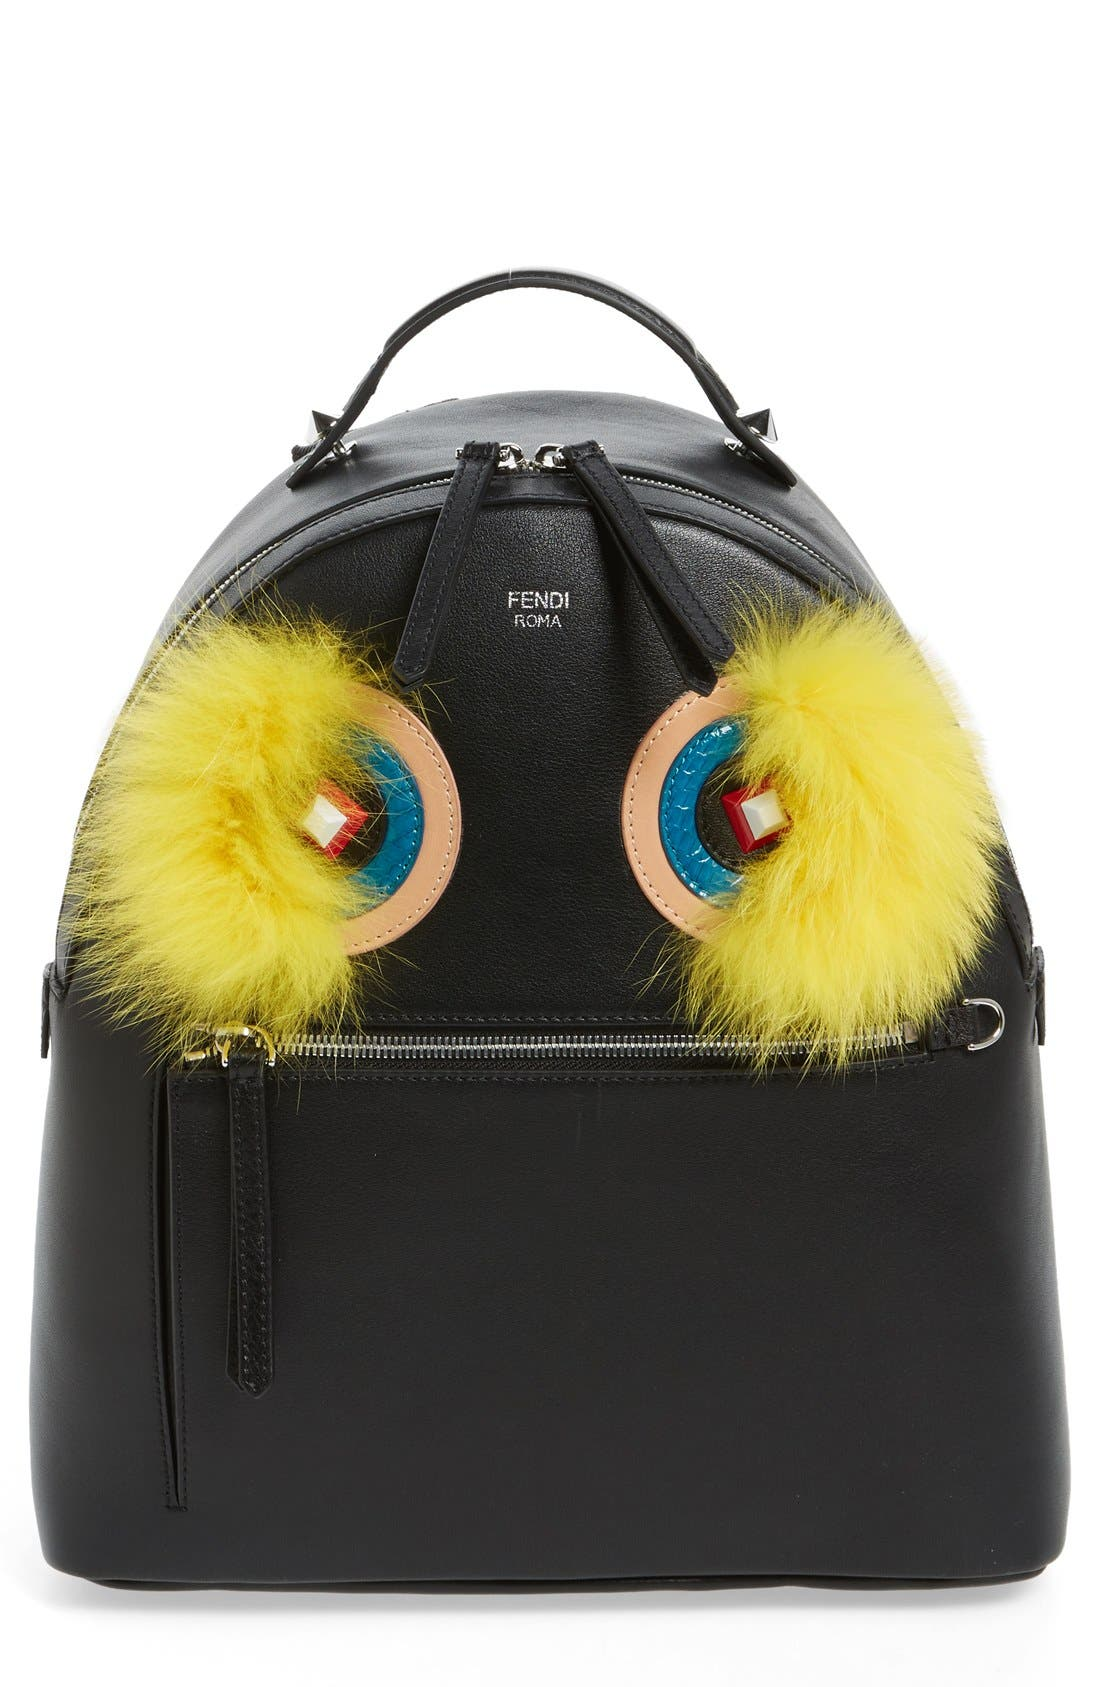 Alternate Image 1 Selected - Fendi 'Monster' Leather Backpack with Genuine Fox Fur & Snakeskin Trim